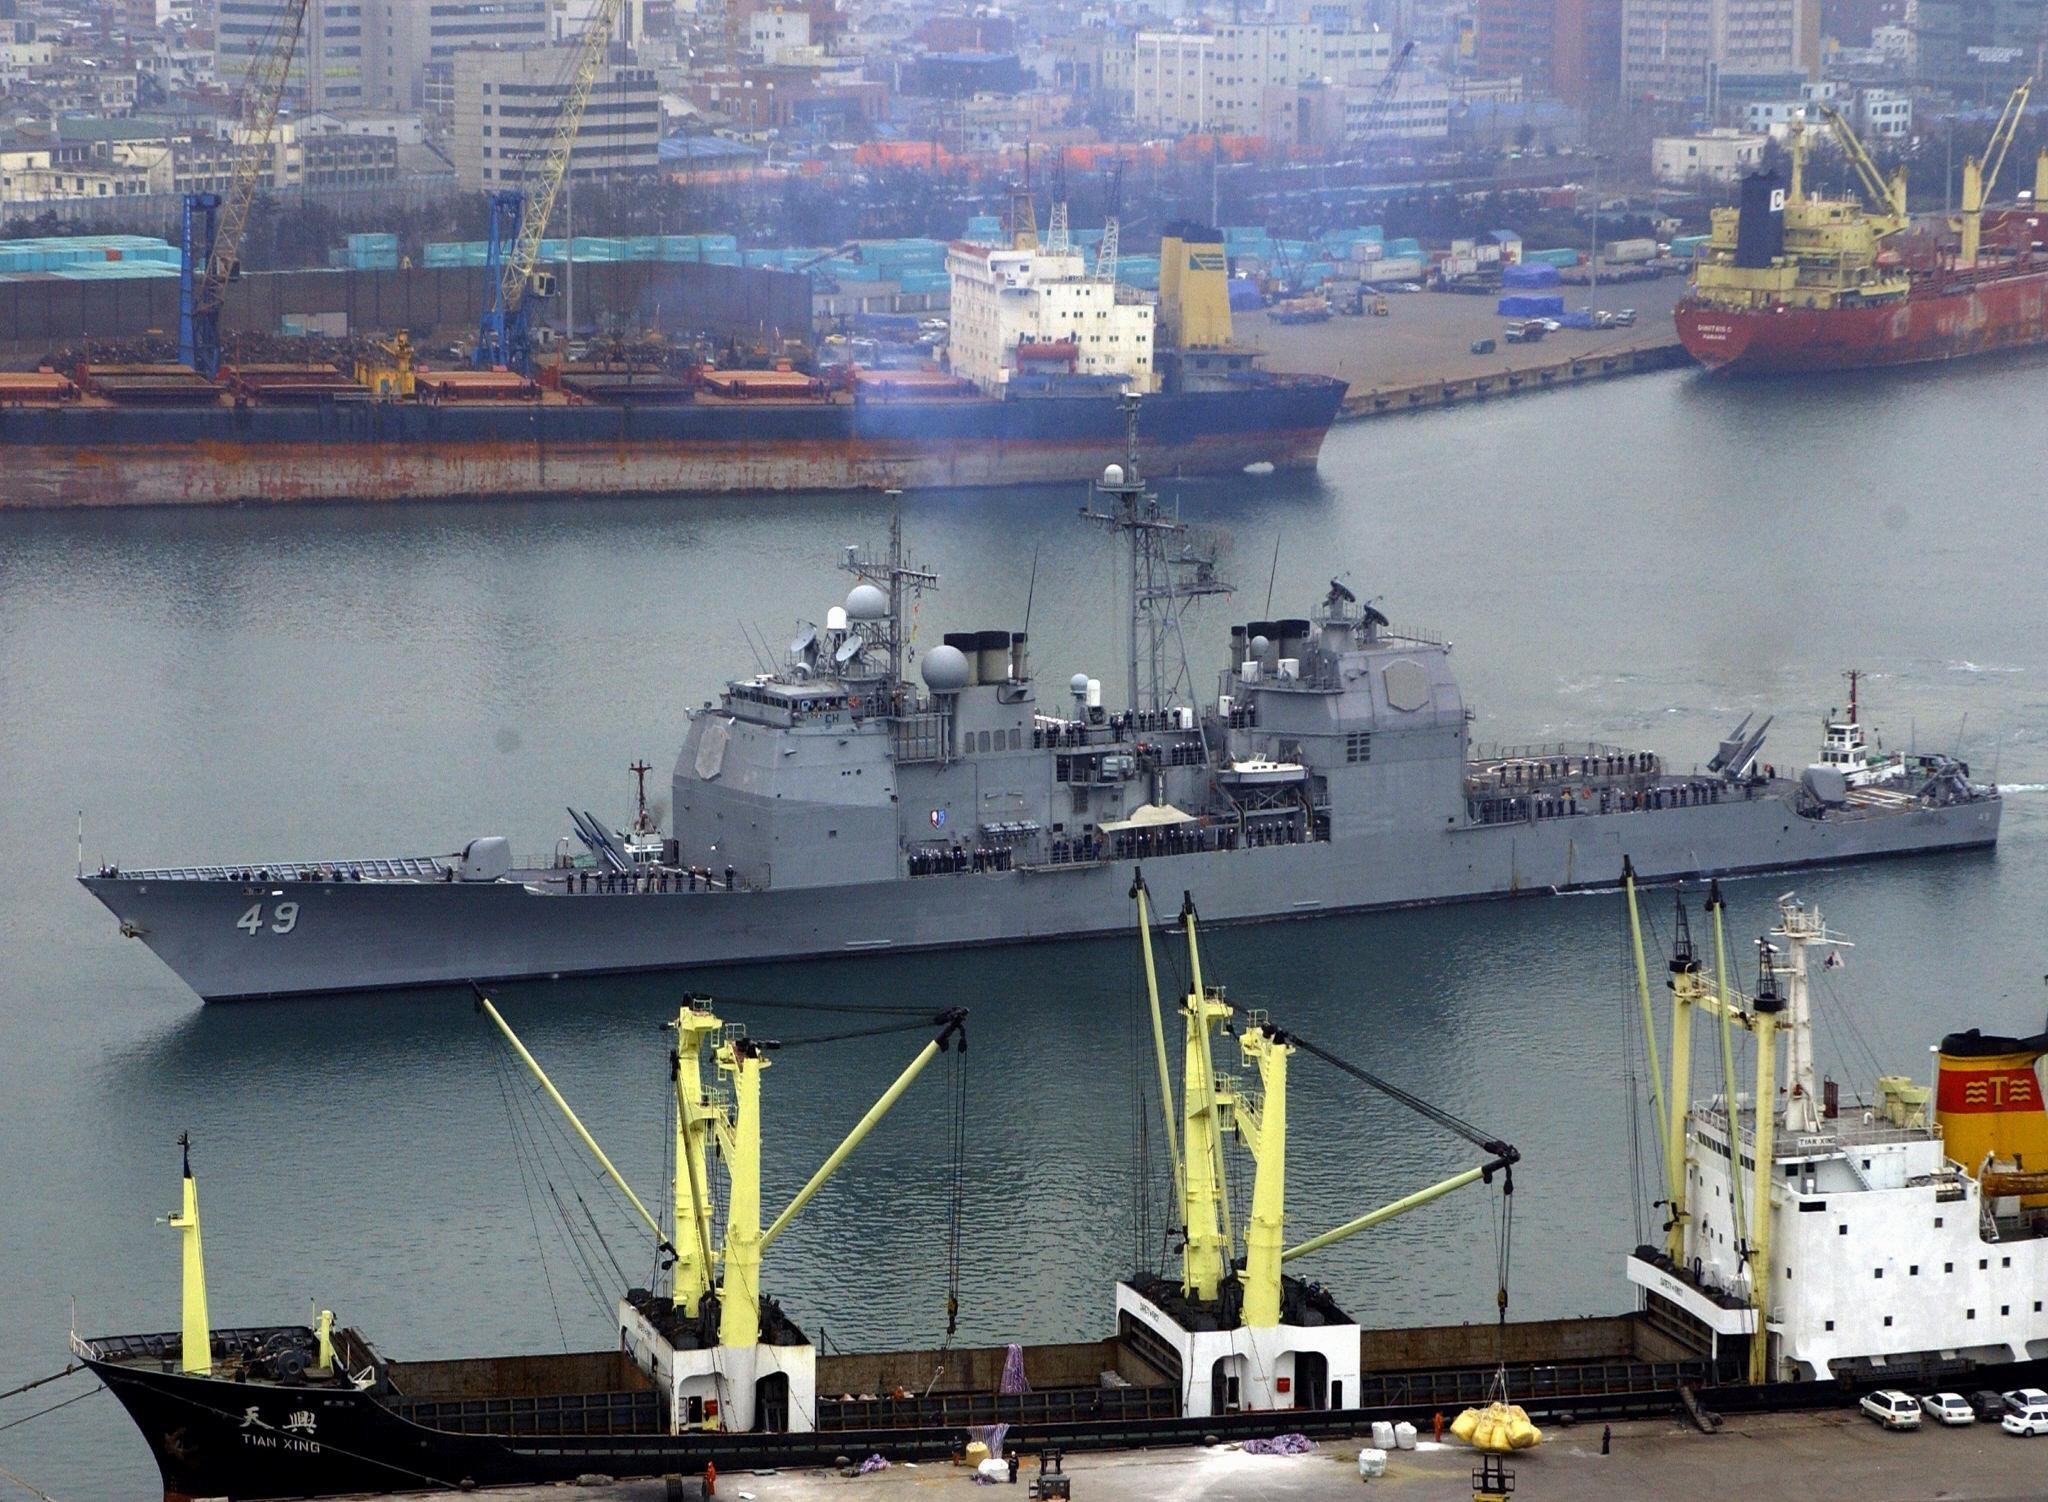 USS CG-49 Vincennes